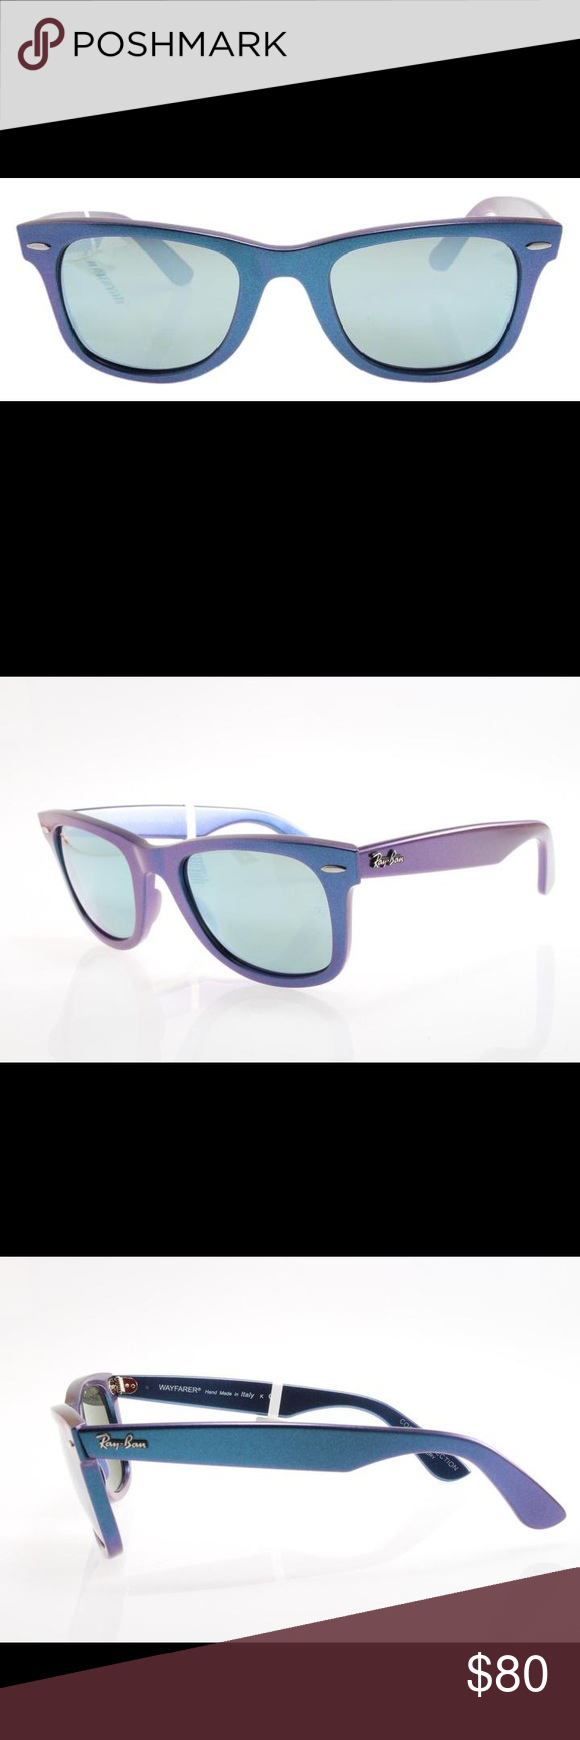 5a0328e9058cd Ray-Ban Blue Wayfarer Cosmo Mercury Sunglasses New original sunglasses Ray  Ban RB 2140 6113